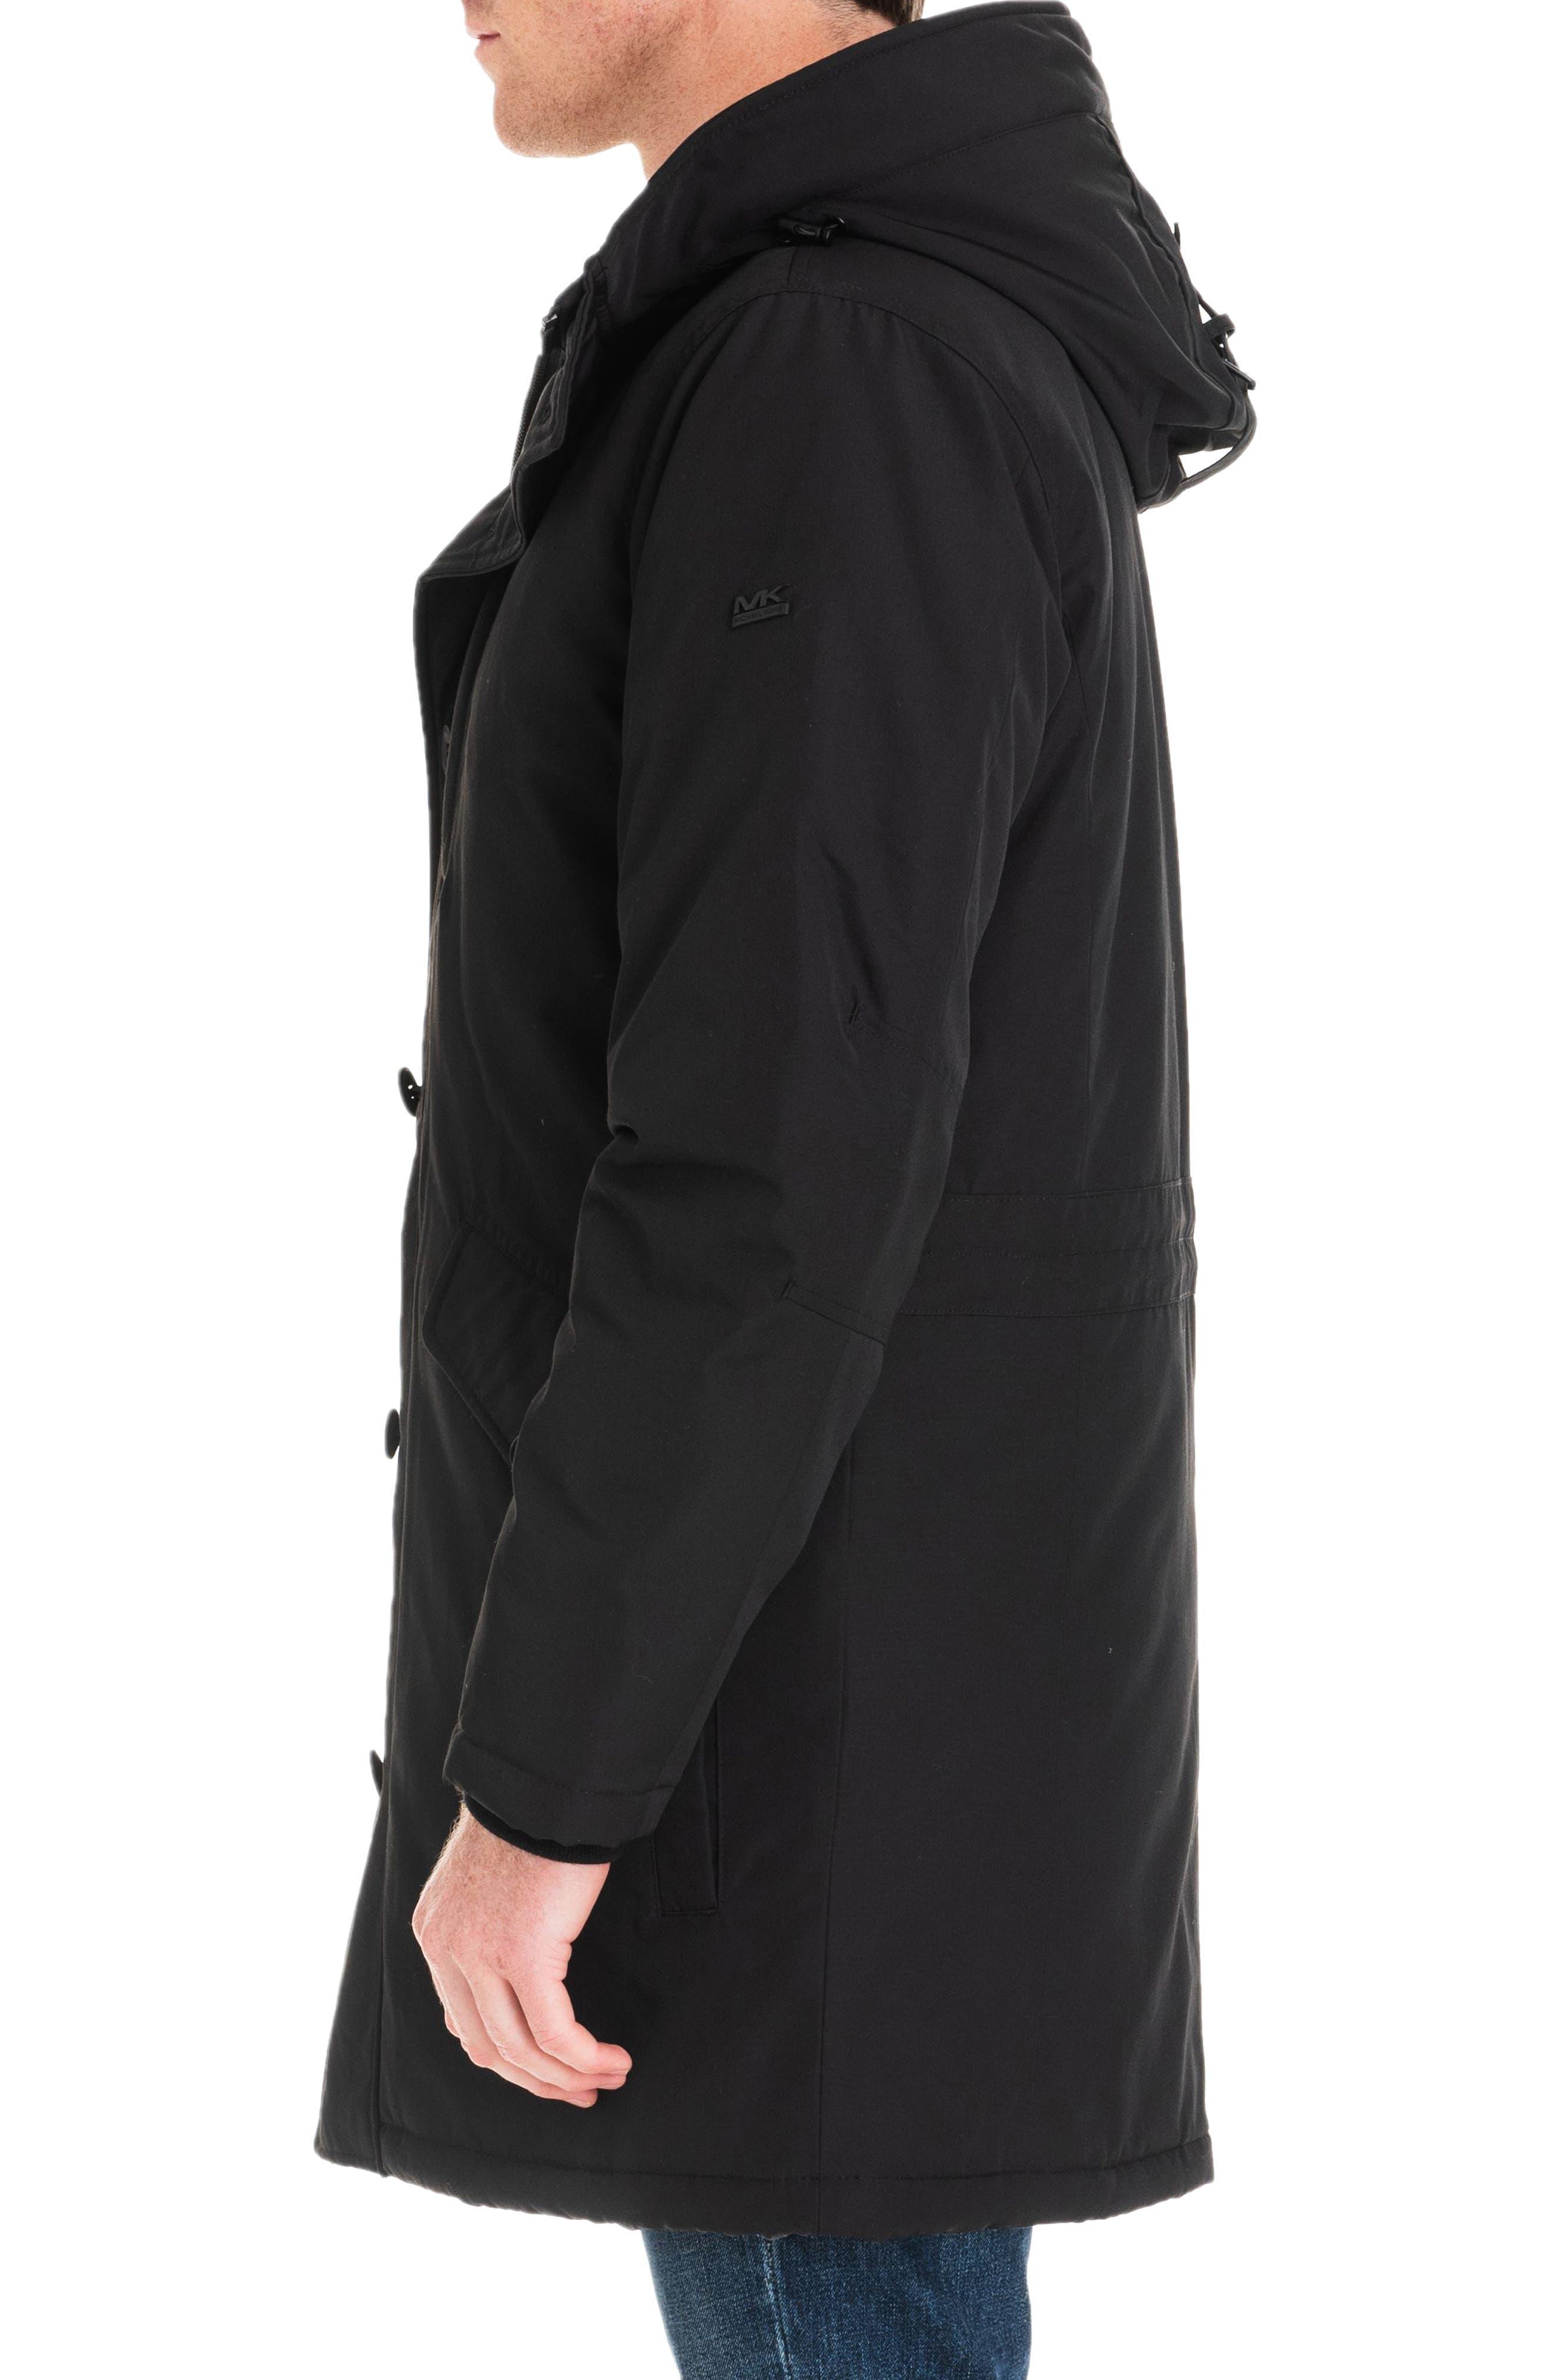 Gardiner Water Resistant Snorkel Coat,                             Alternate thumbnail 3, color,                             BLACK/ MIDNIGHT